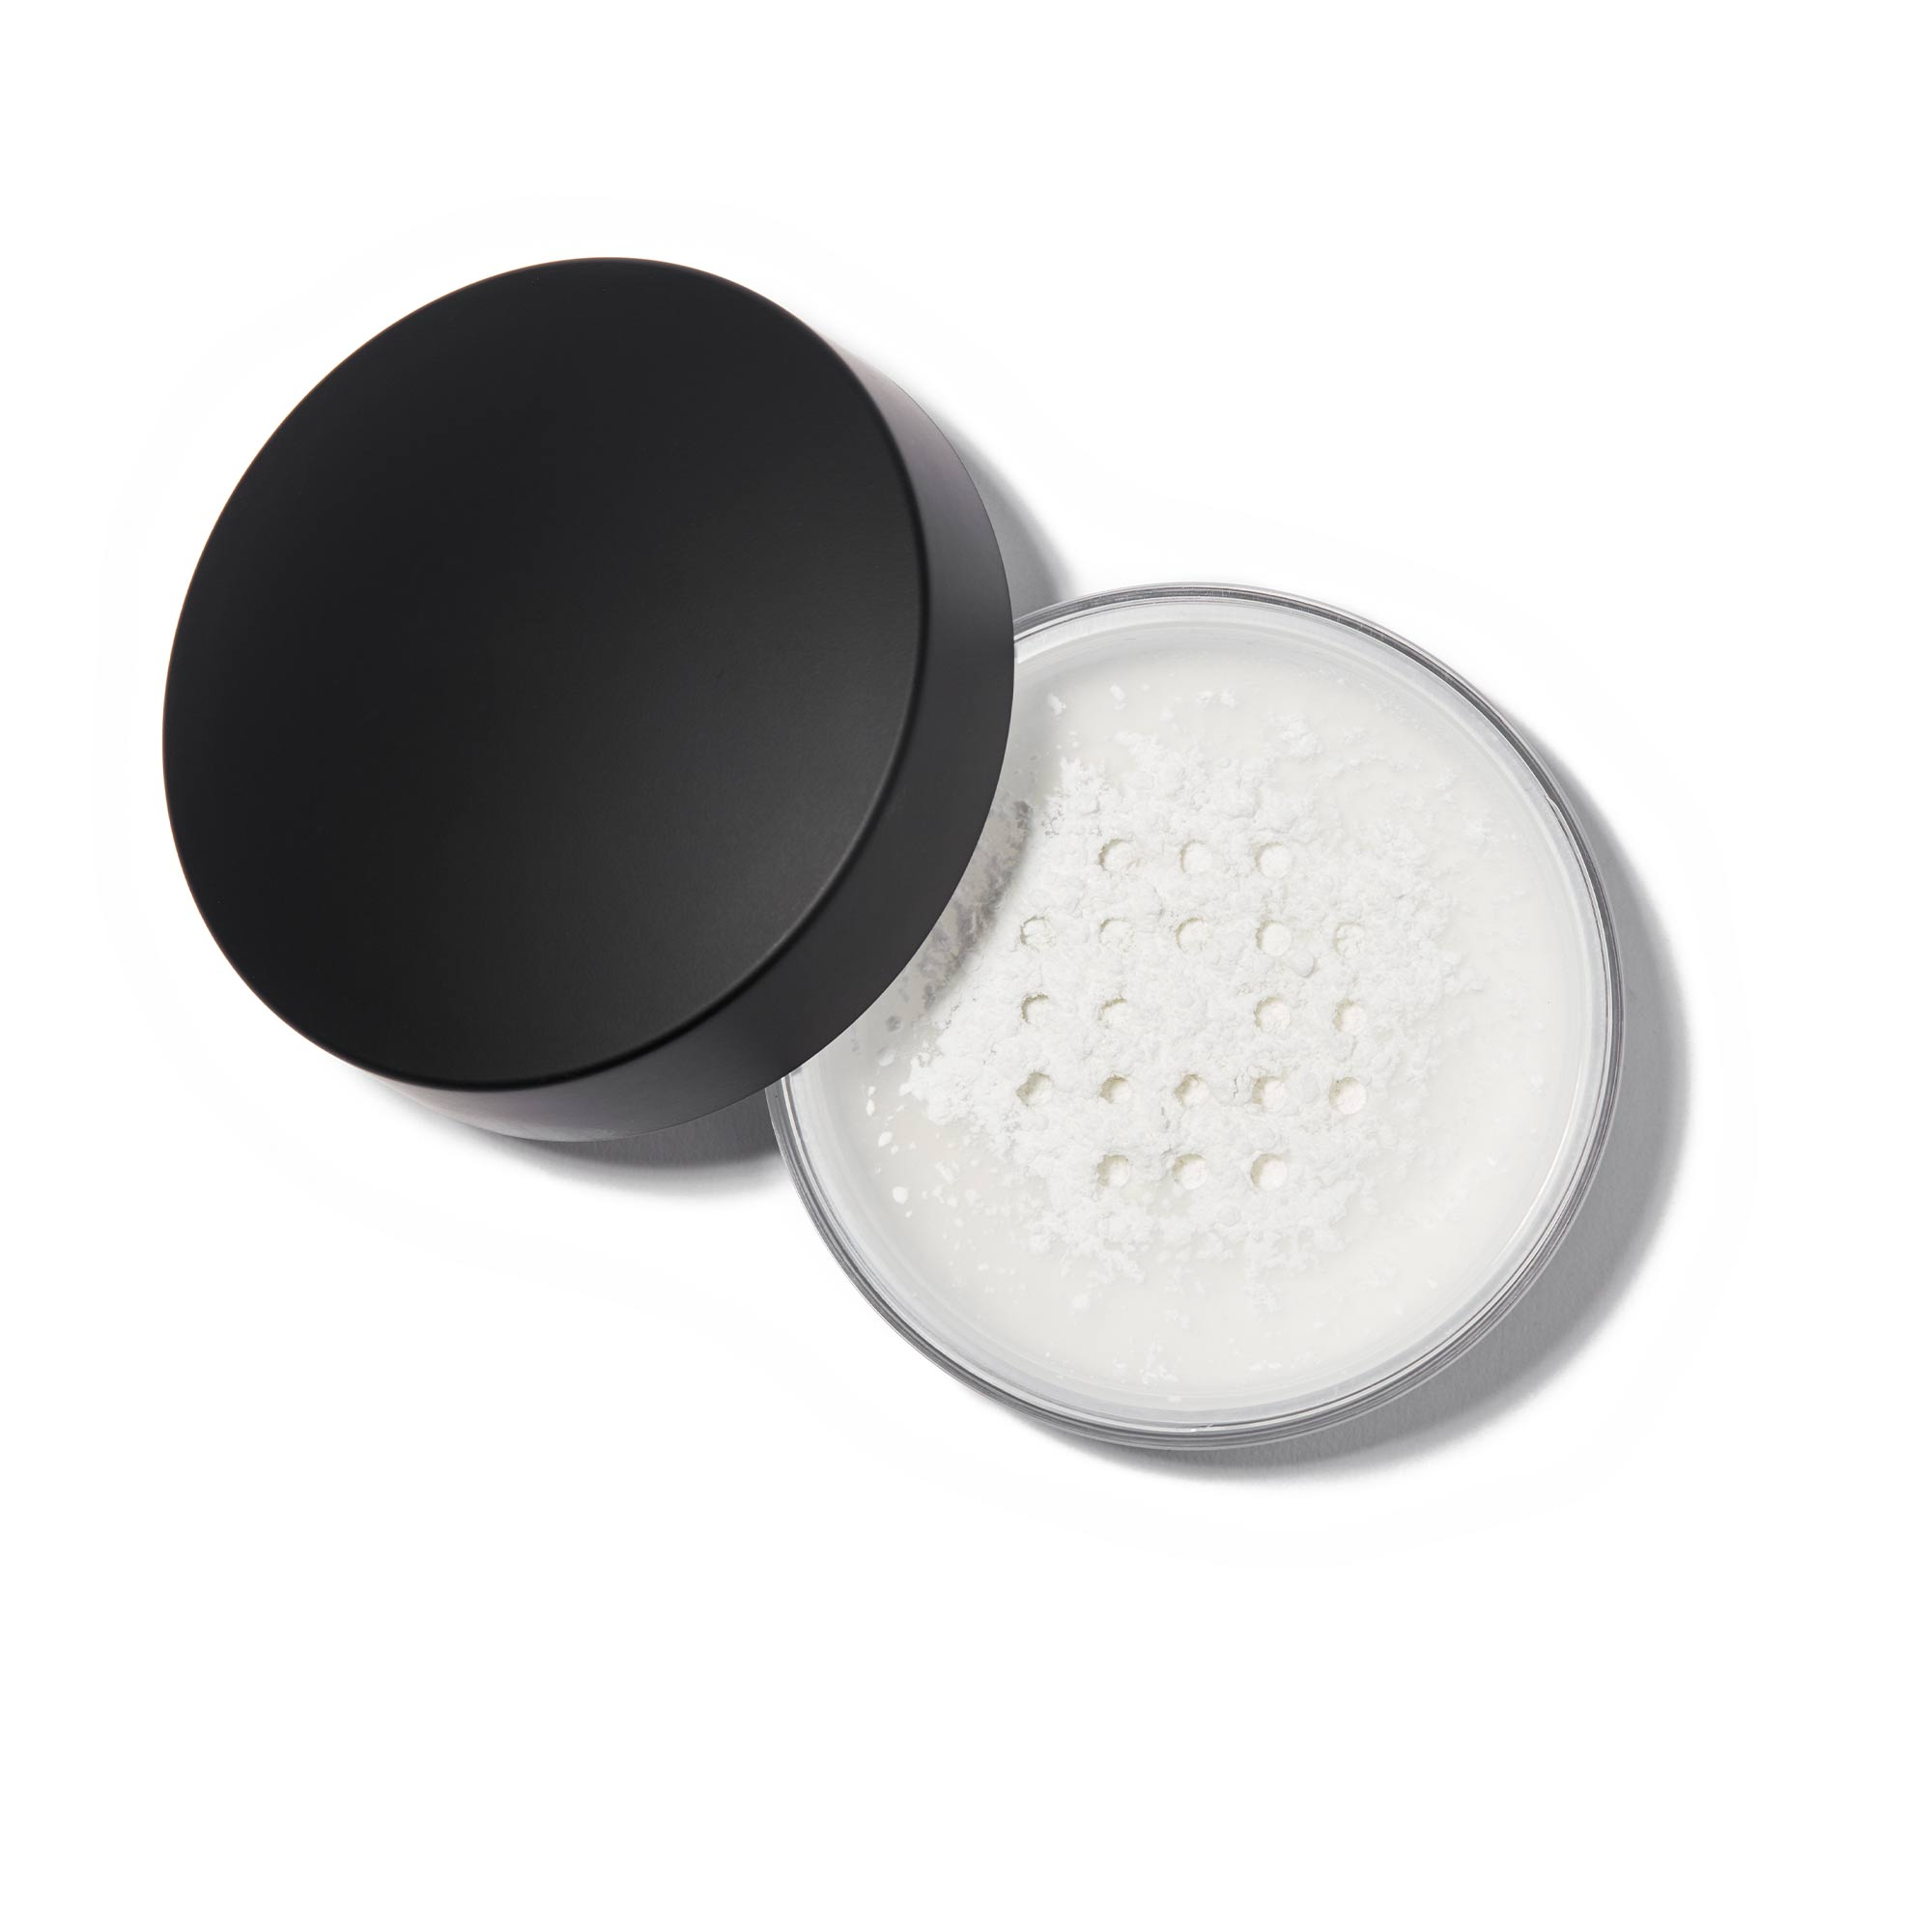 Loose Setting Powder - Translucent